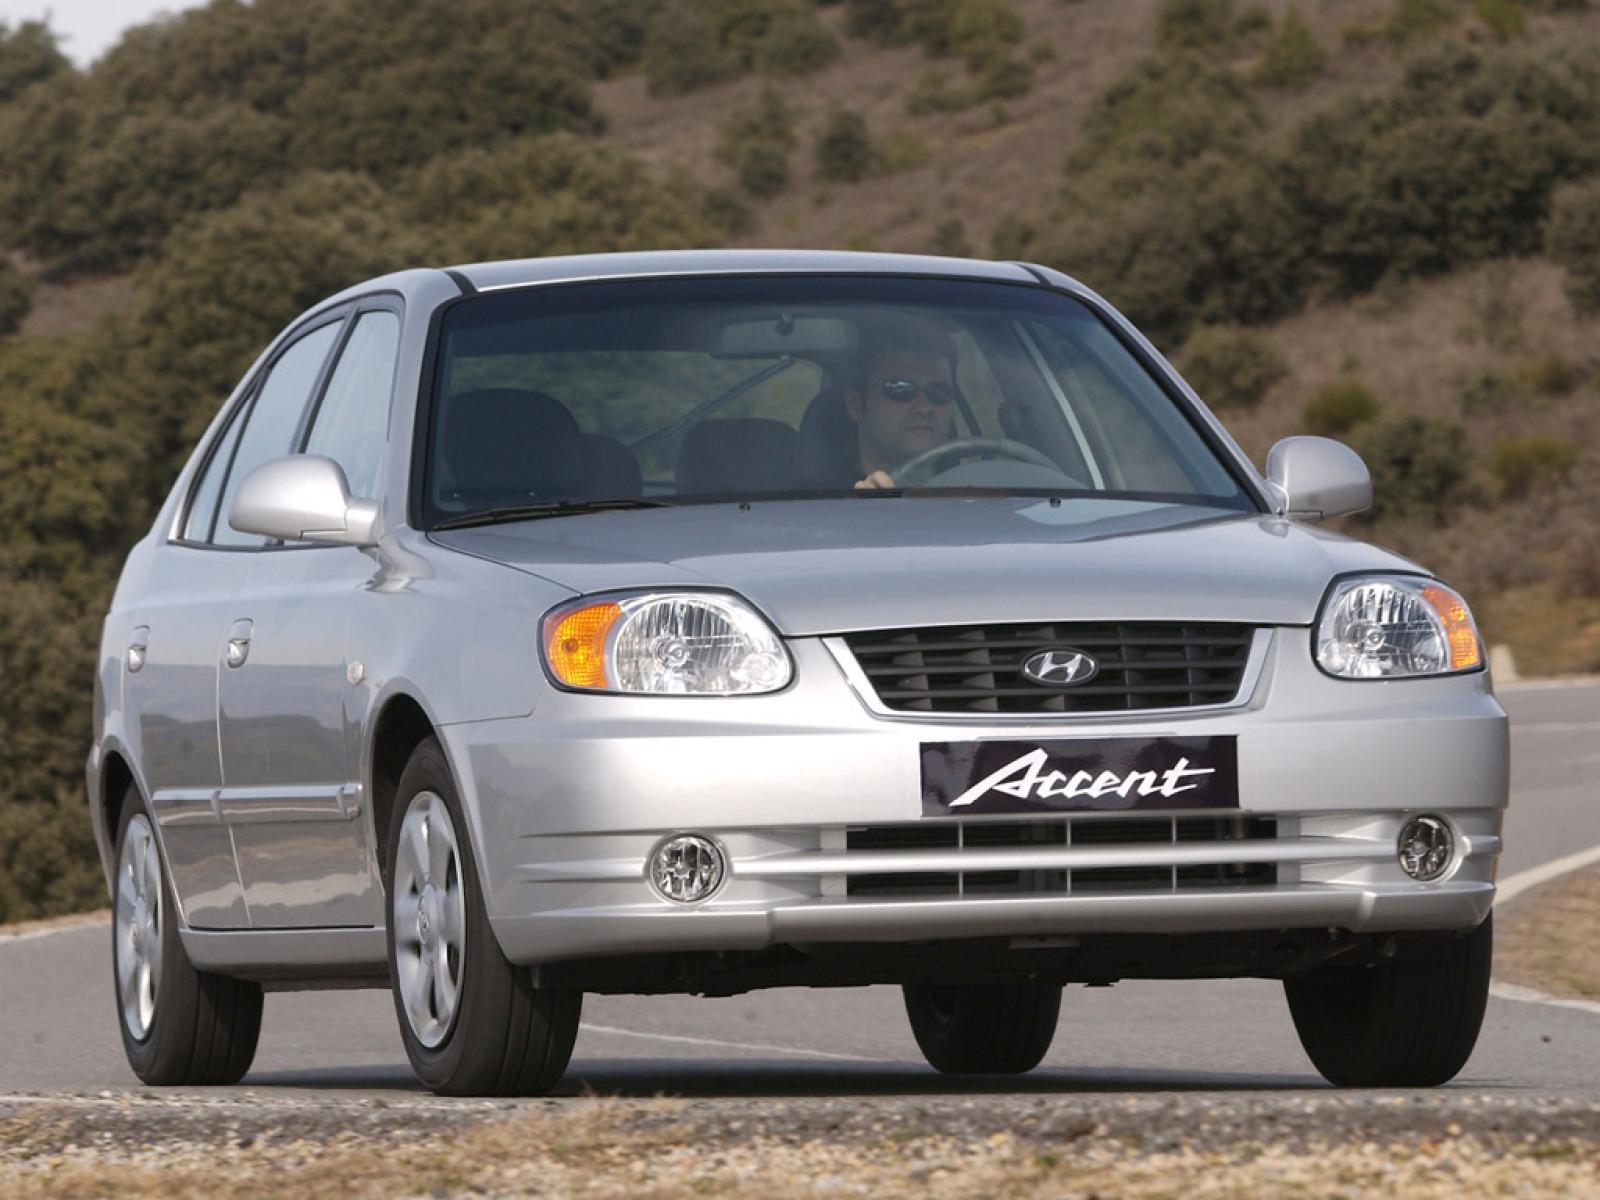 2001 hyundai accent manual transmission problems